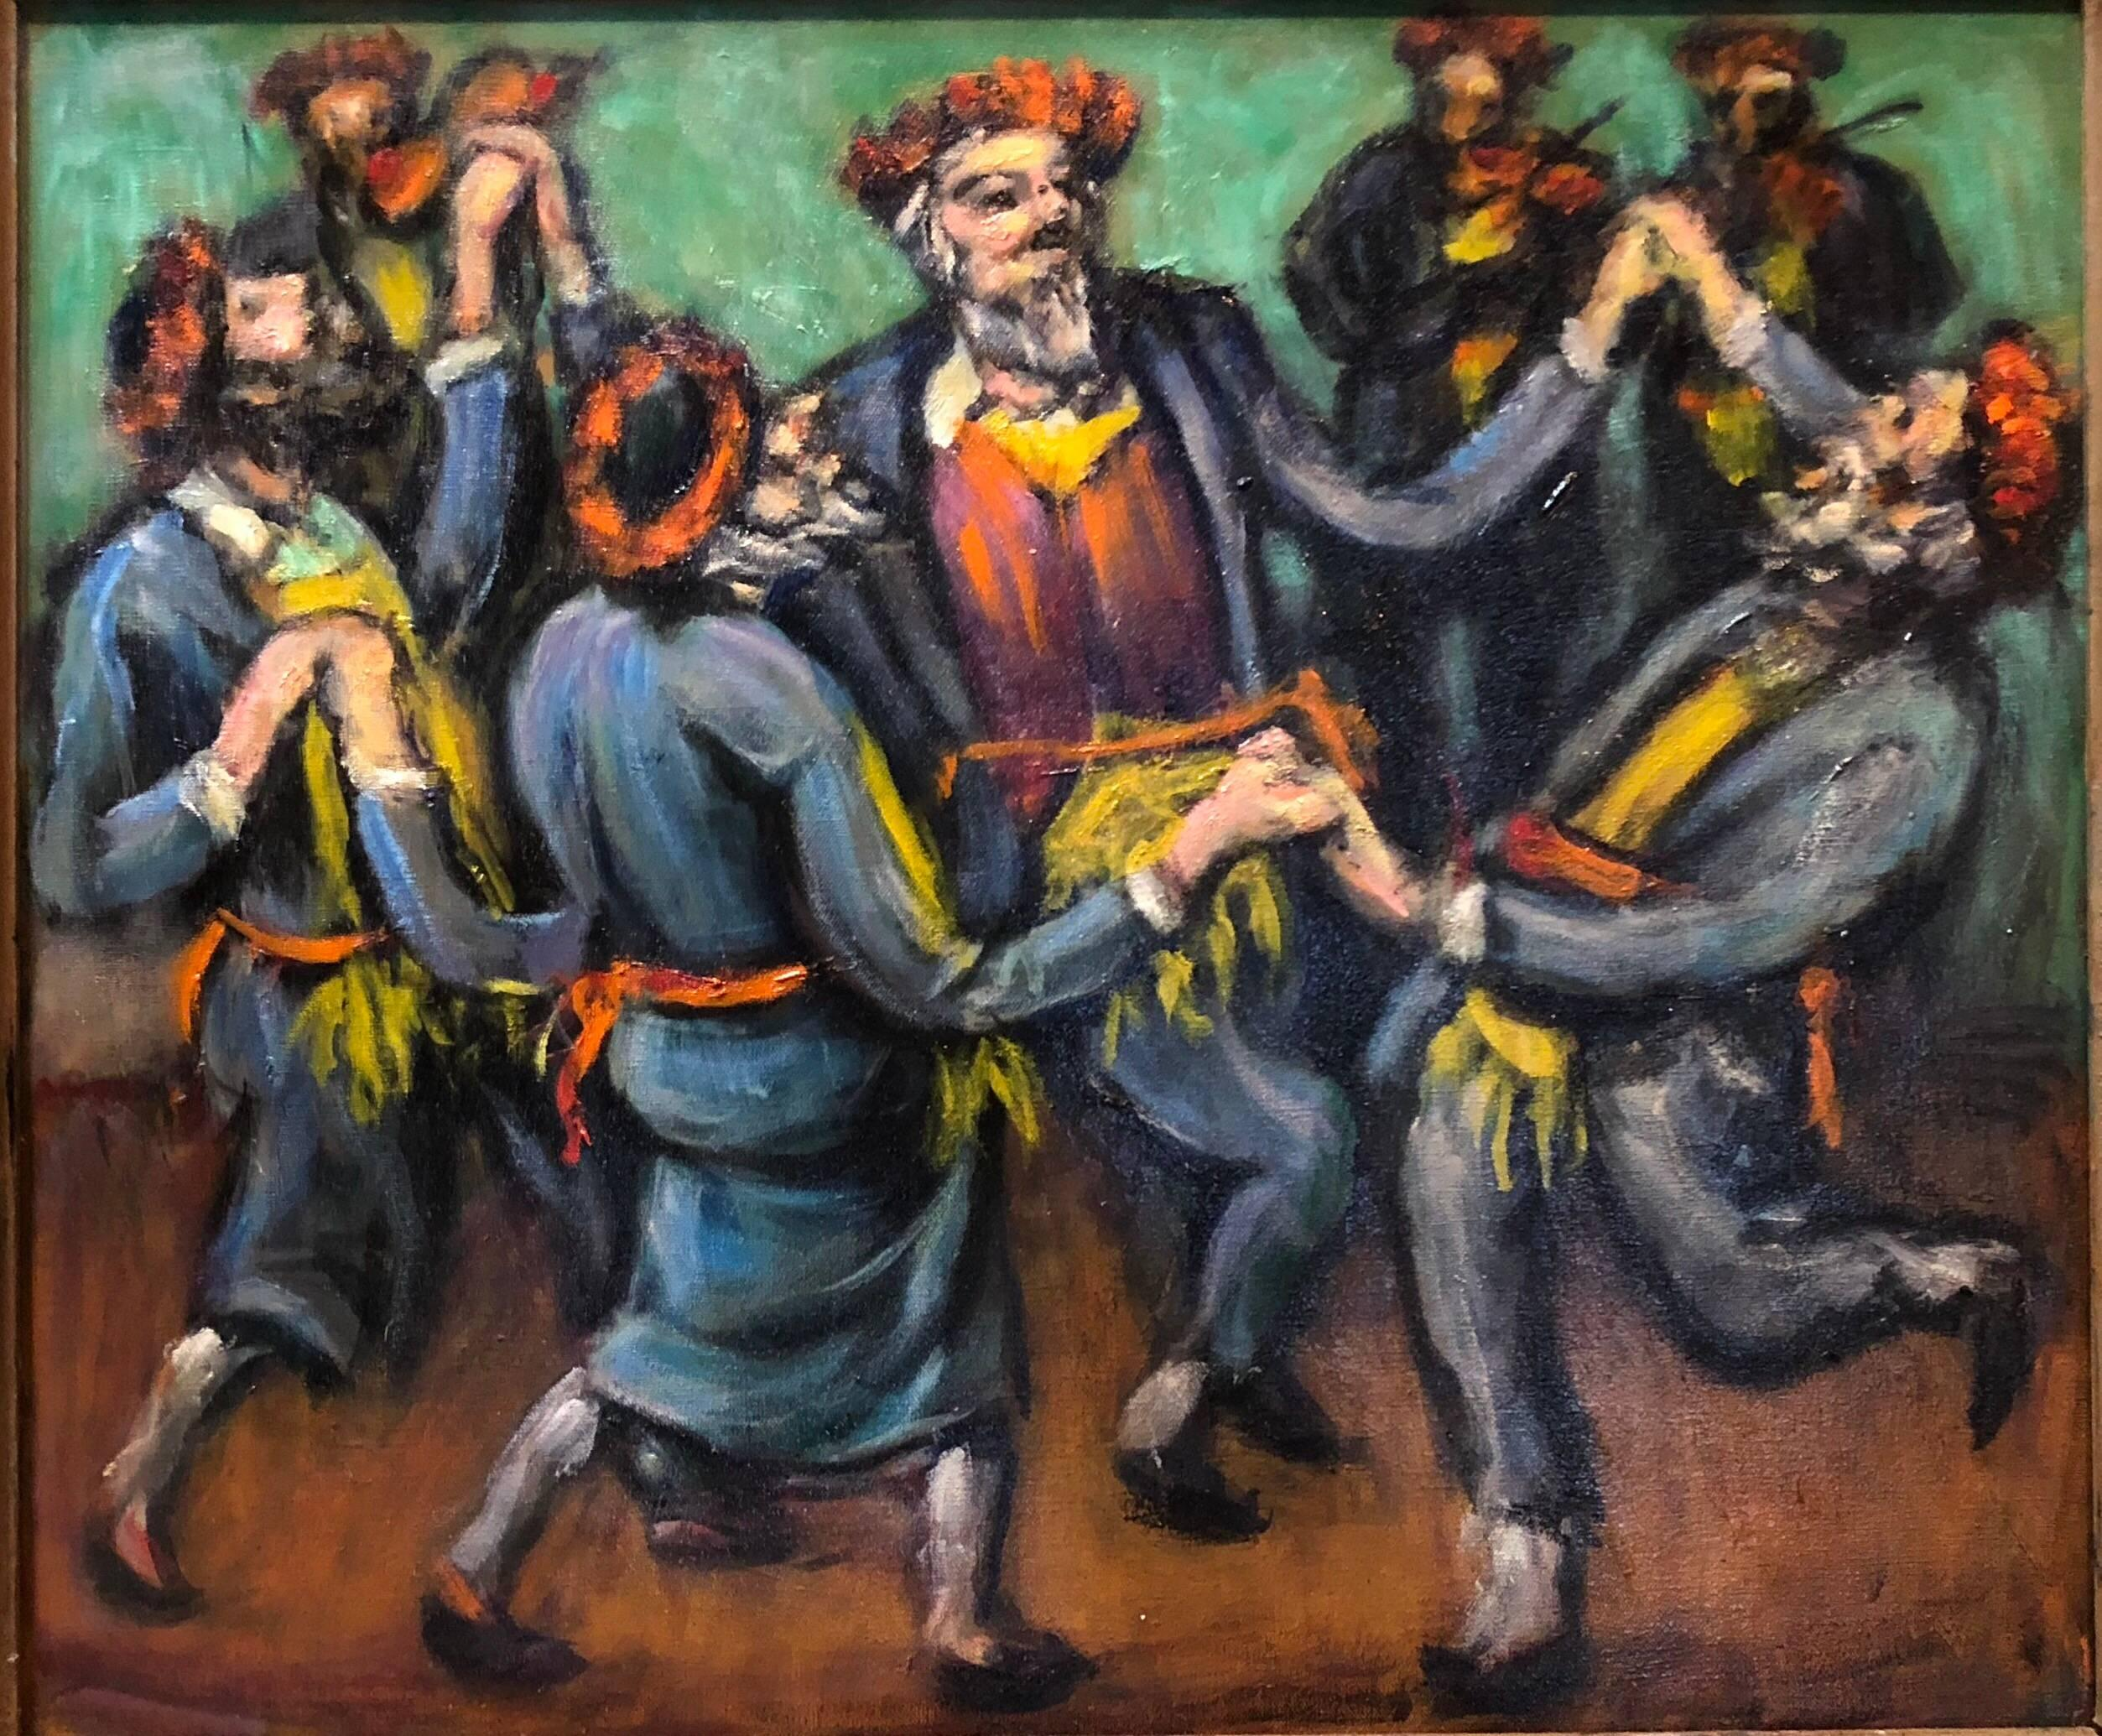 Hassidim Dancing, Rare Judaica Oil Painting Manner of Tully Fllmus